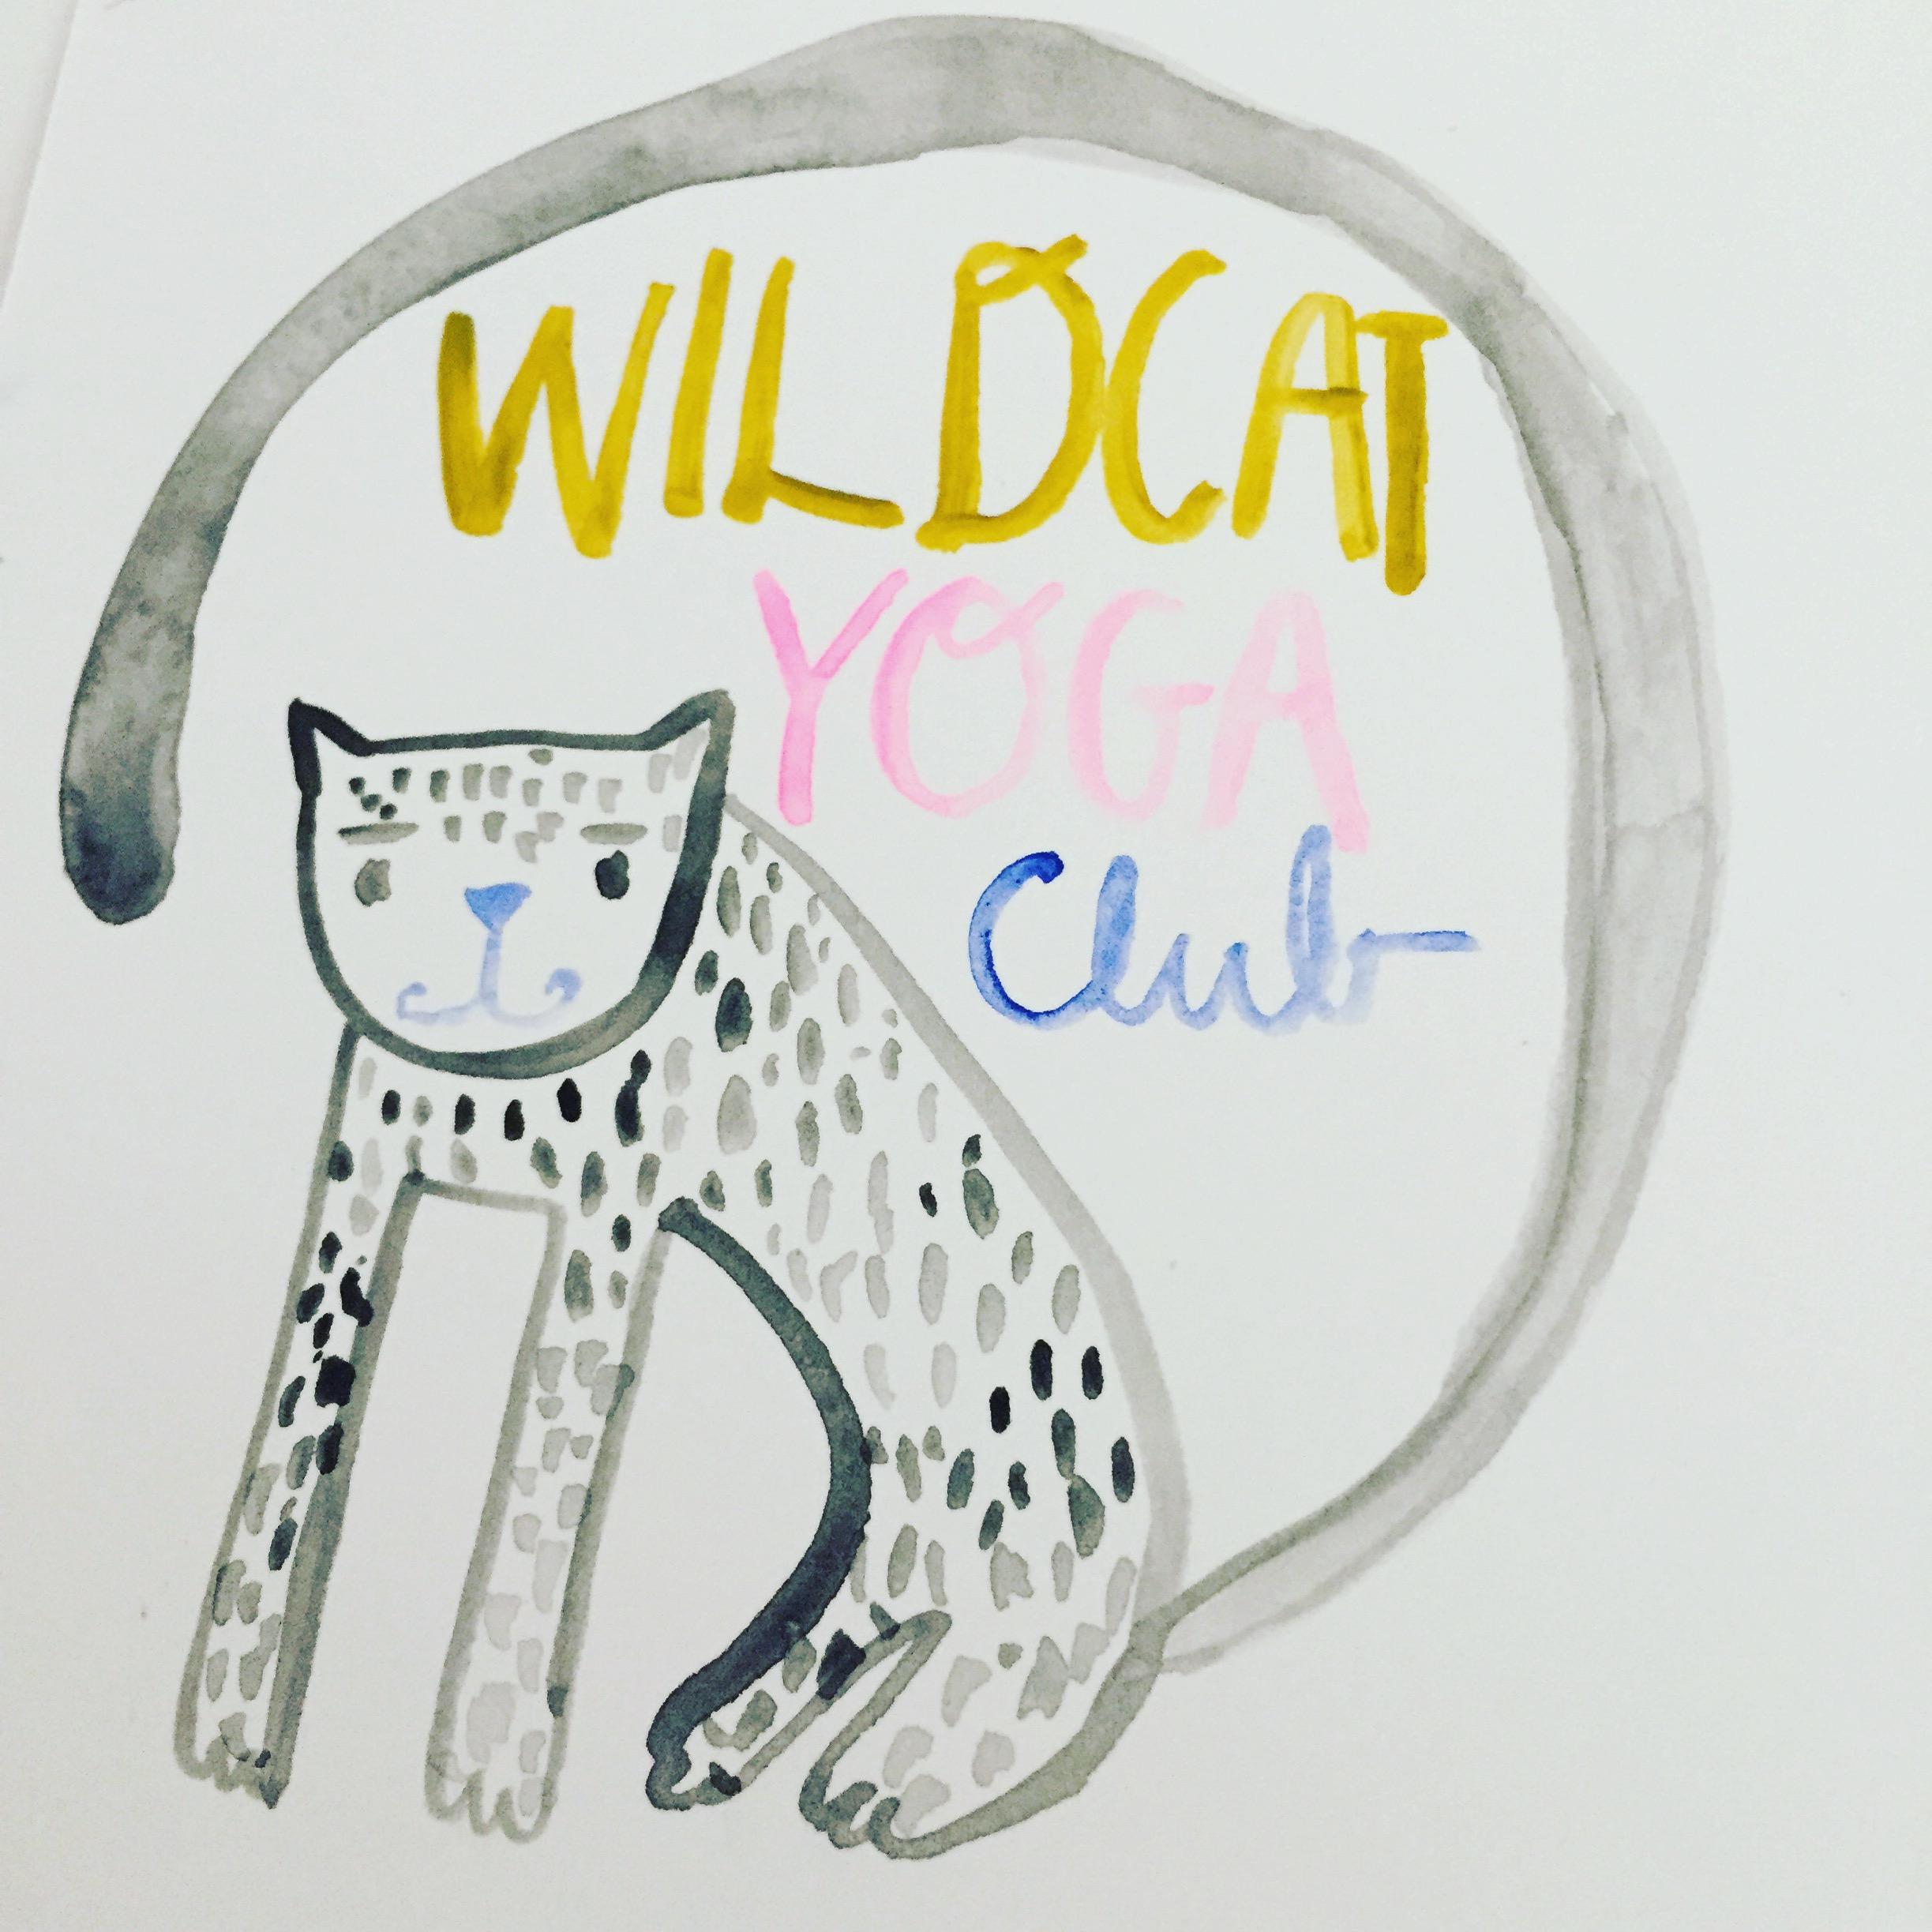 WILDCAT YOGA CLUB